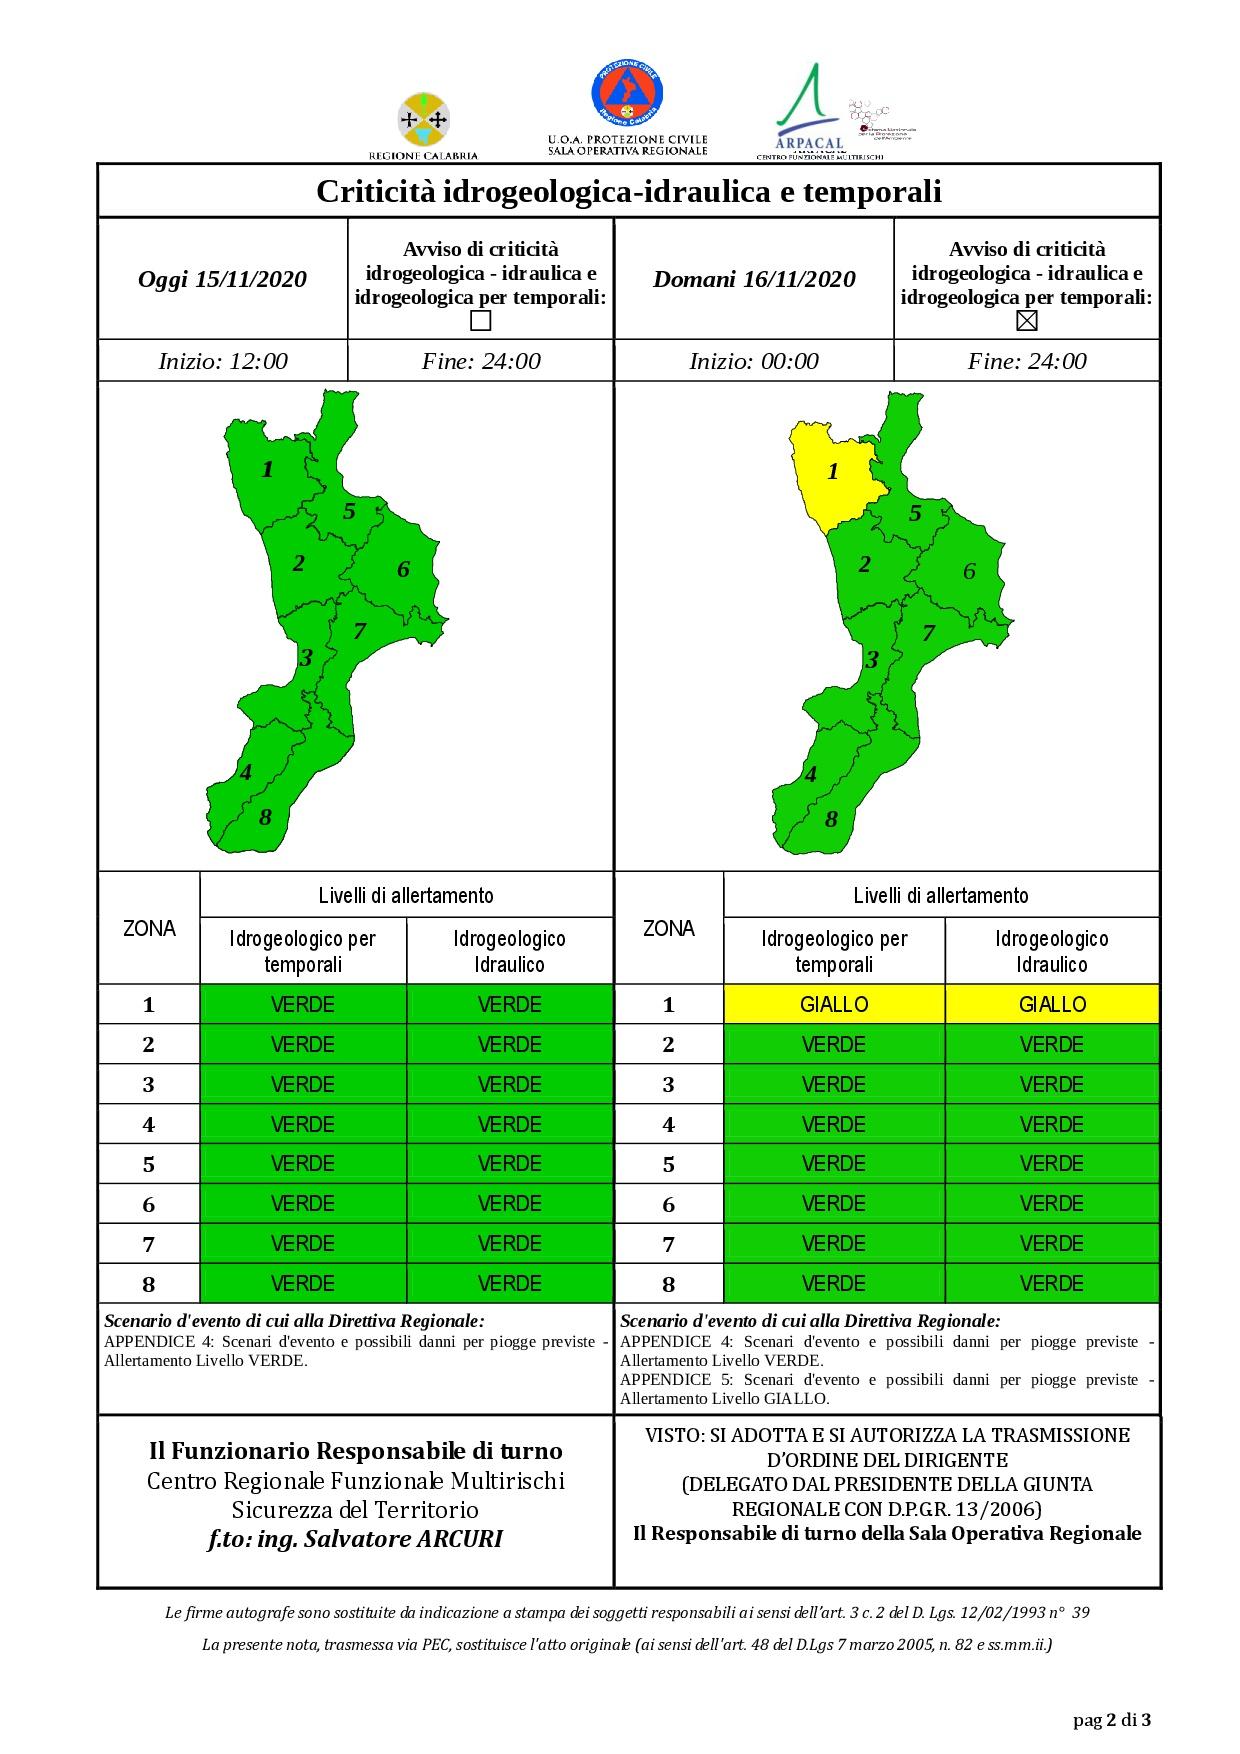 Criticità idrogeologica-idraulica e temporali in Calabria 15-11-2020